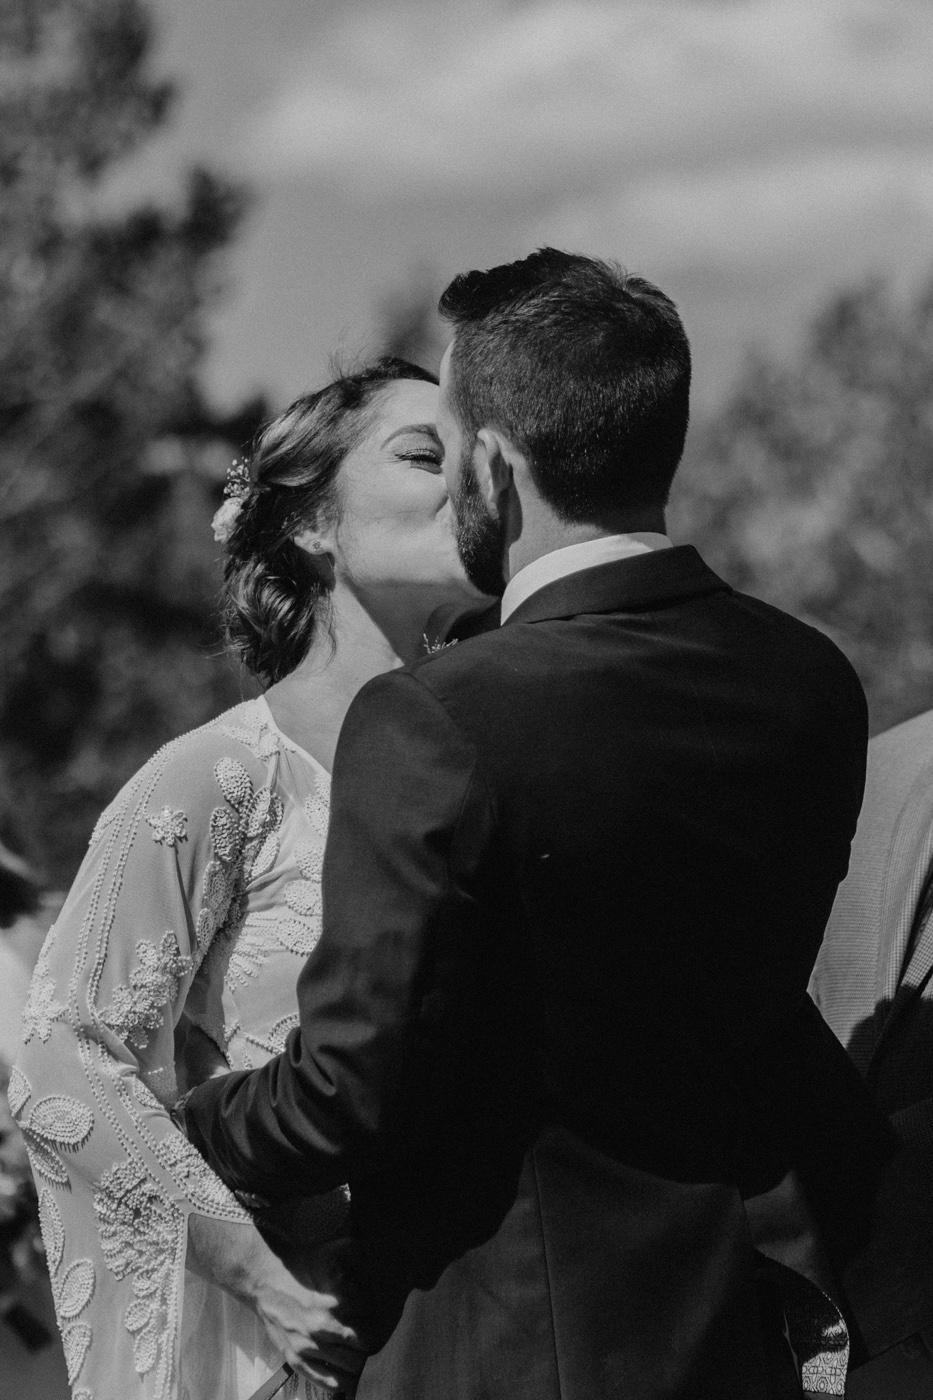 woods-walk-trail-crested-butte-colorado-wedding-53.jpg